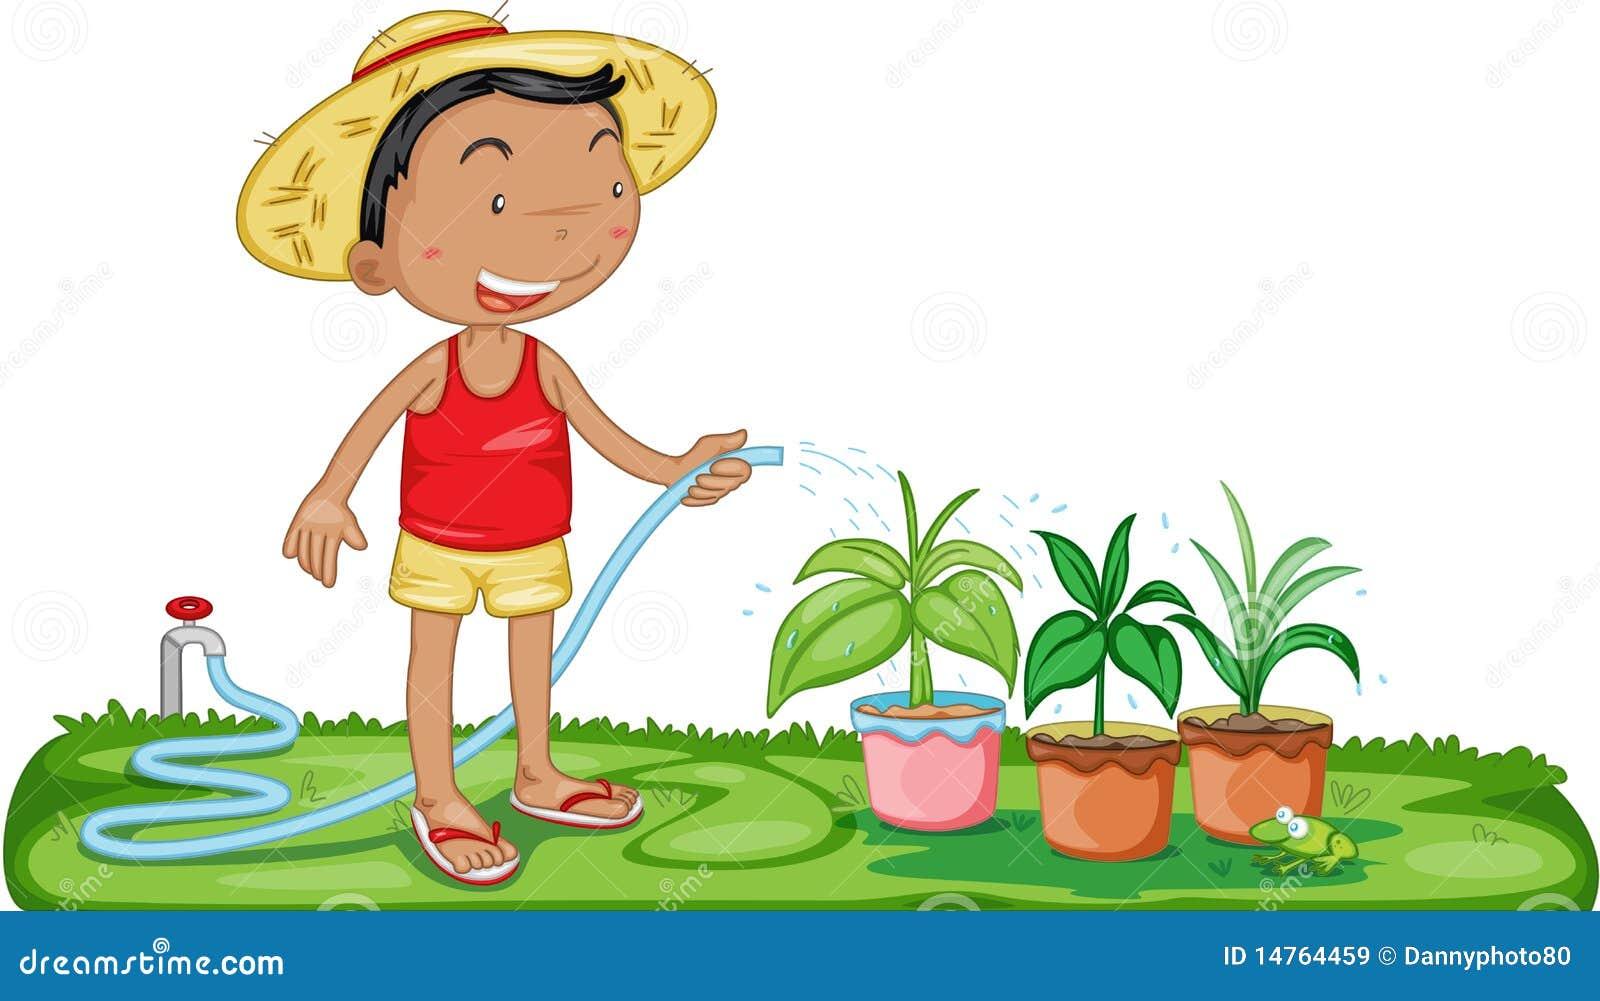 Free Worksheets xl worksheet : Plantas Molhando De Um Menino Imagens de Stock Royalty ...